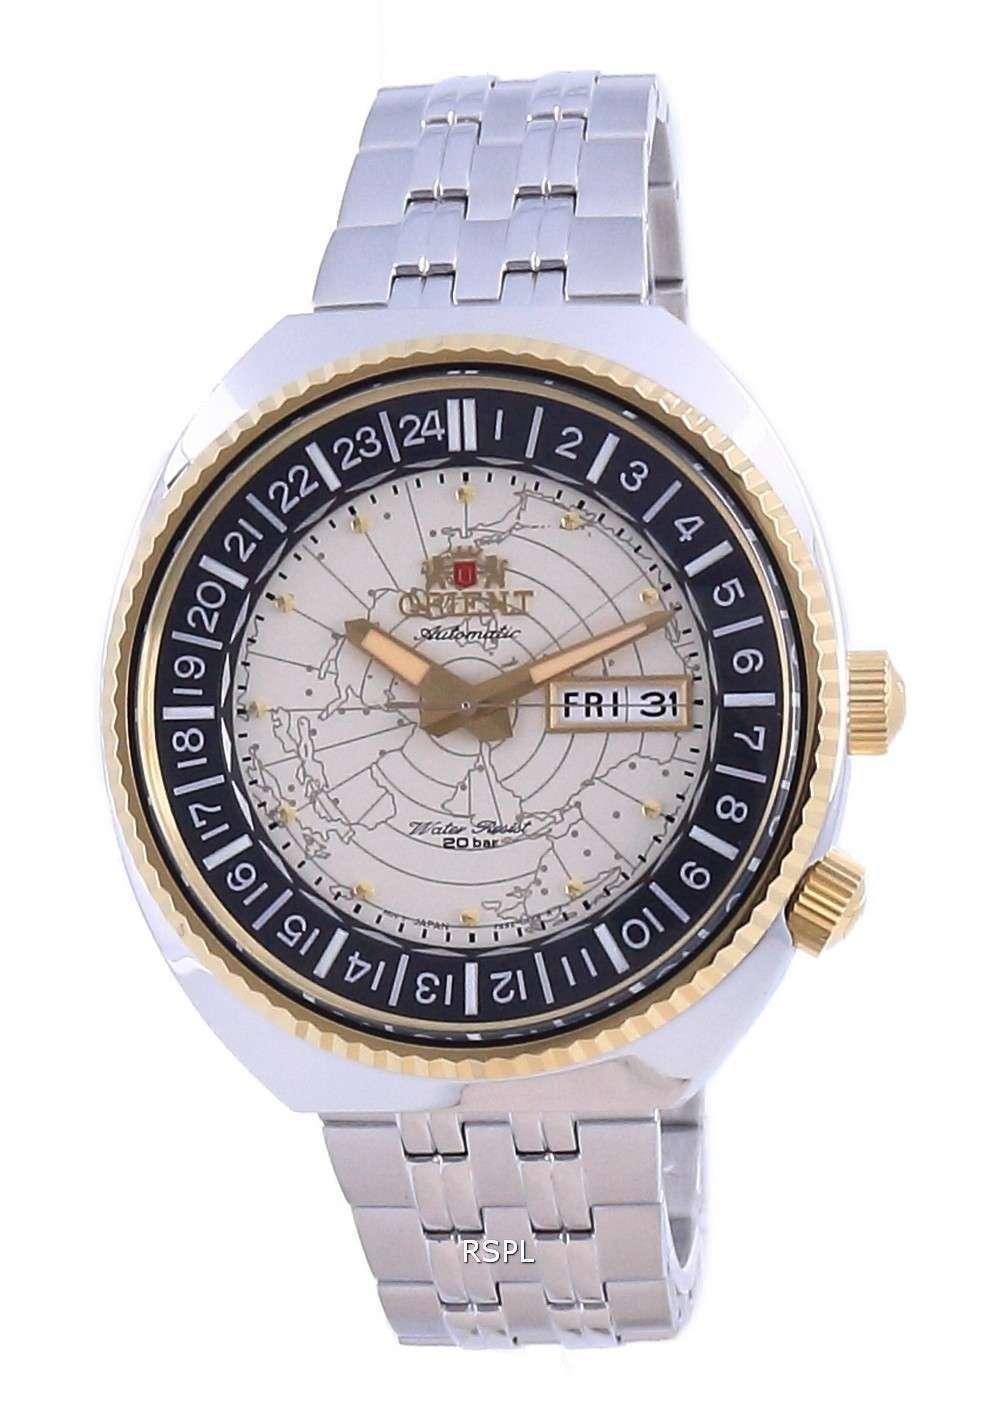 Reloj para hombre Orient World Map Revival de acero inoxidable automático Diver&#39,s RA-AA0E01S19B 200M